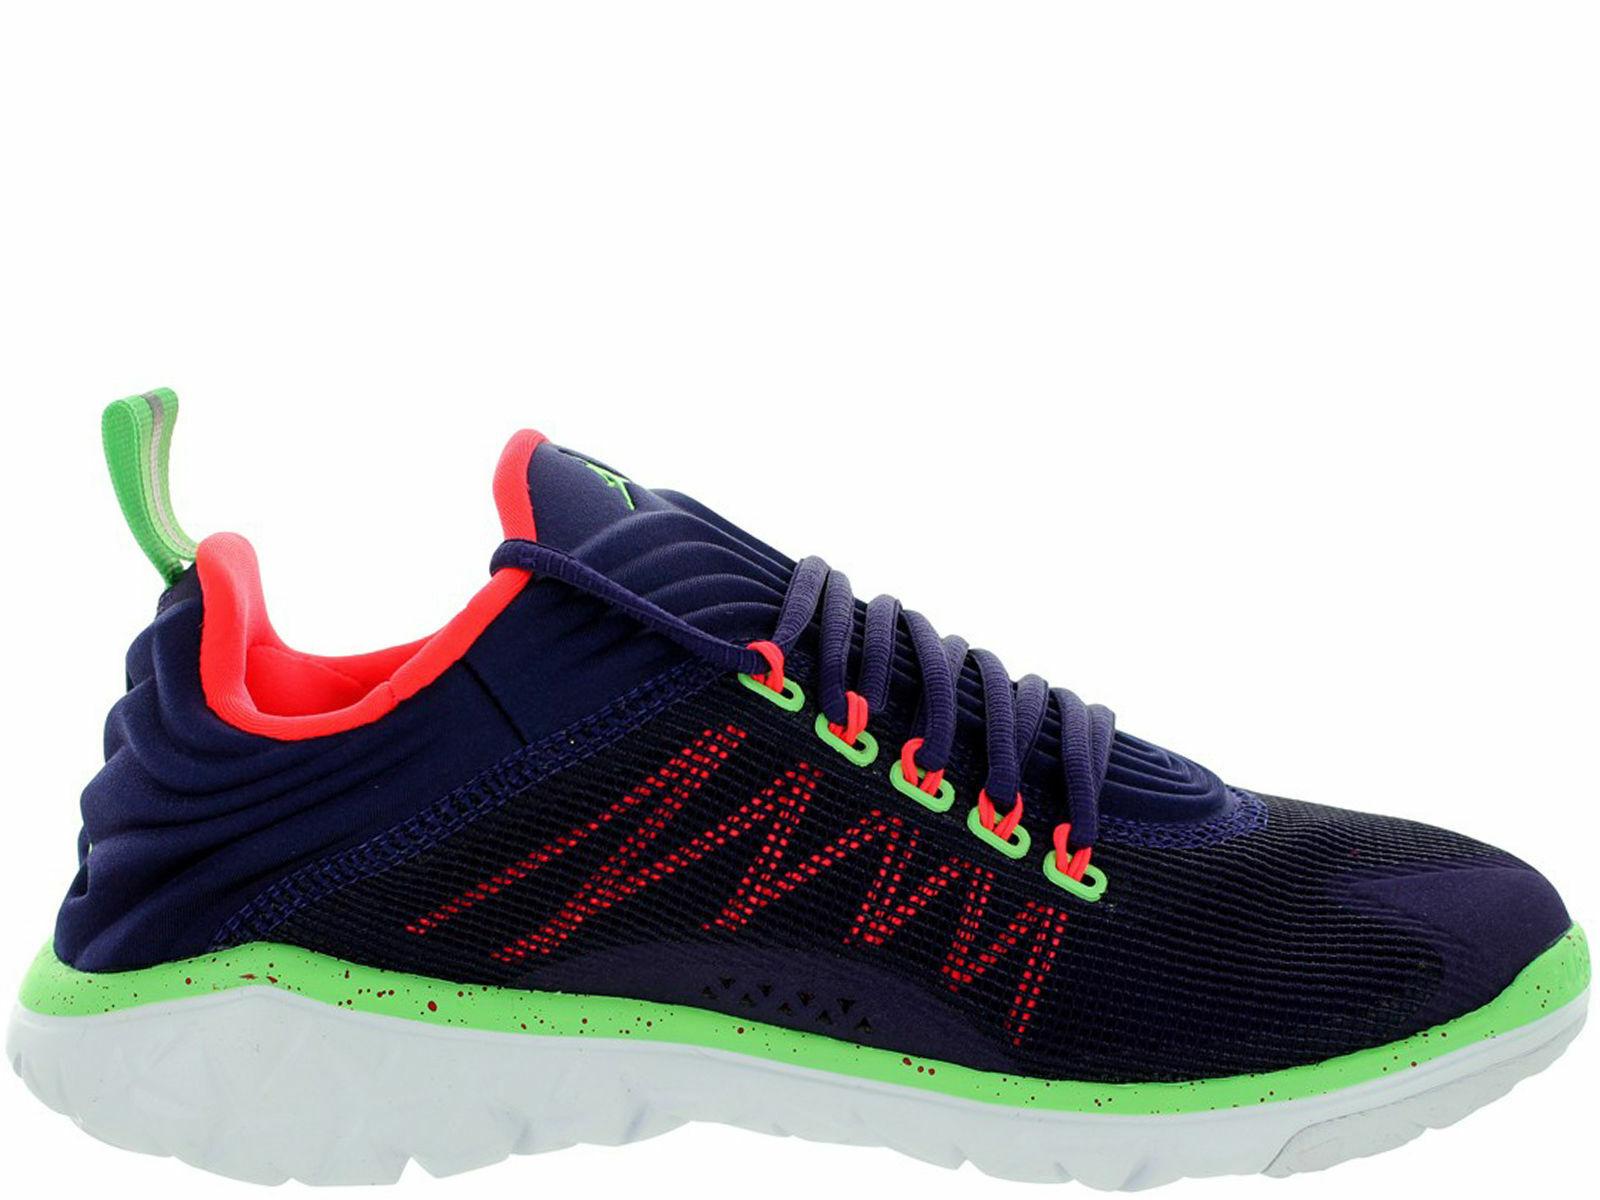 Mens New Jordan 654268 532 Flight Flex Trainer Athletic Fashion Sneakers 11 US